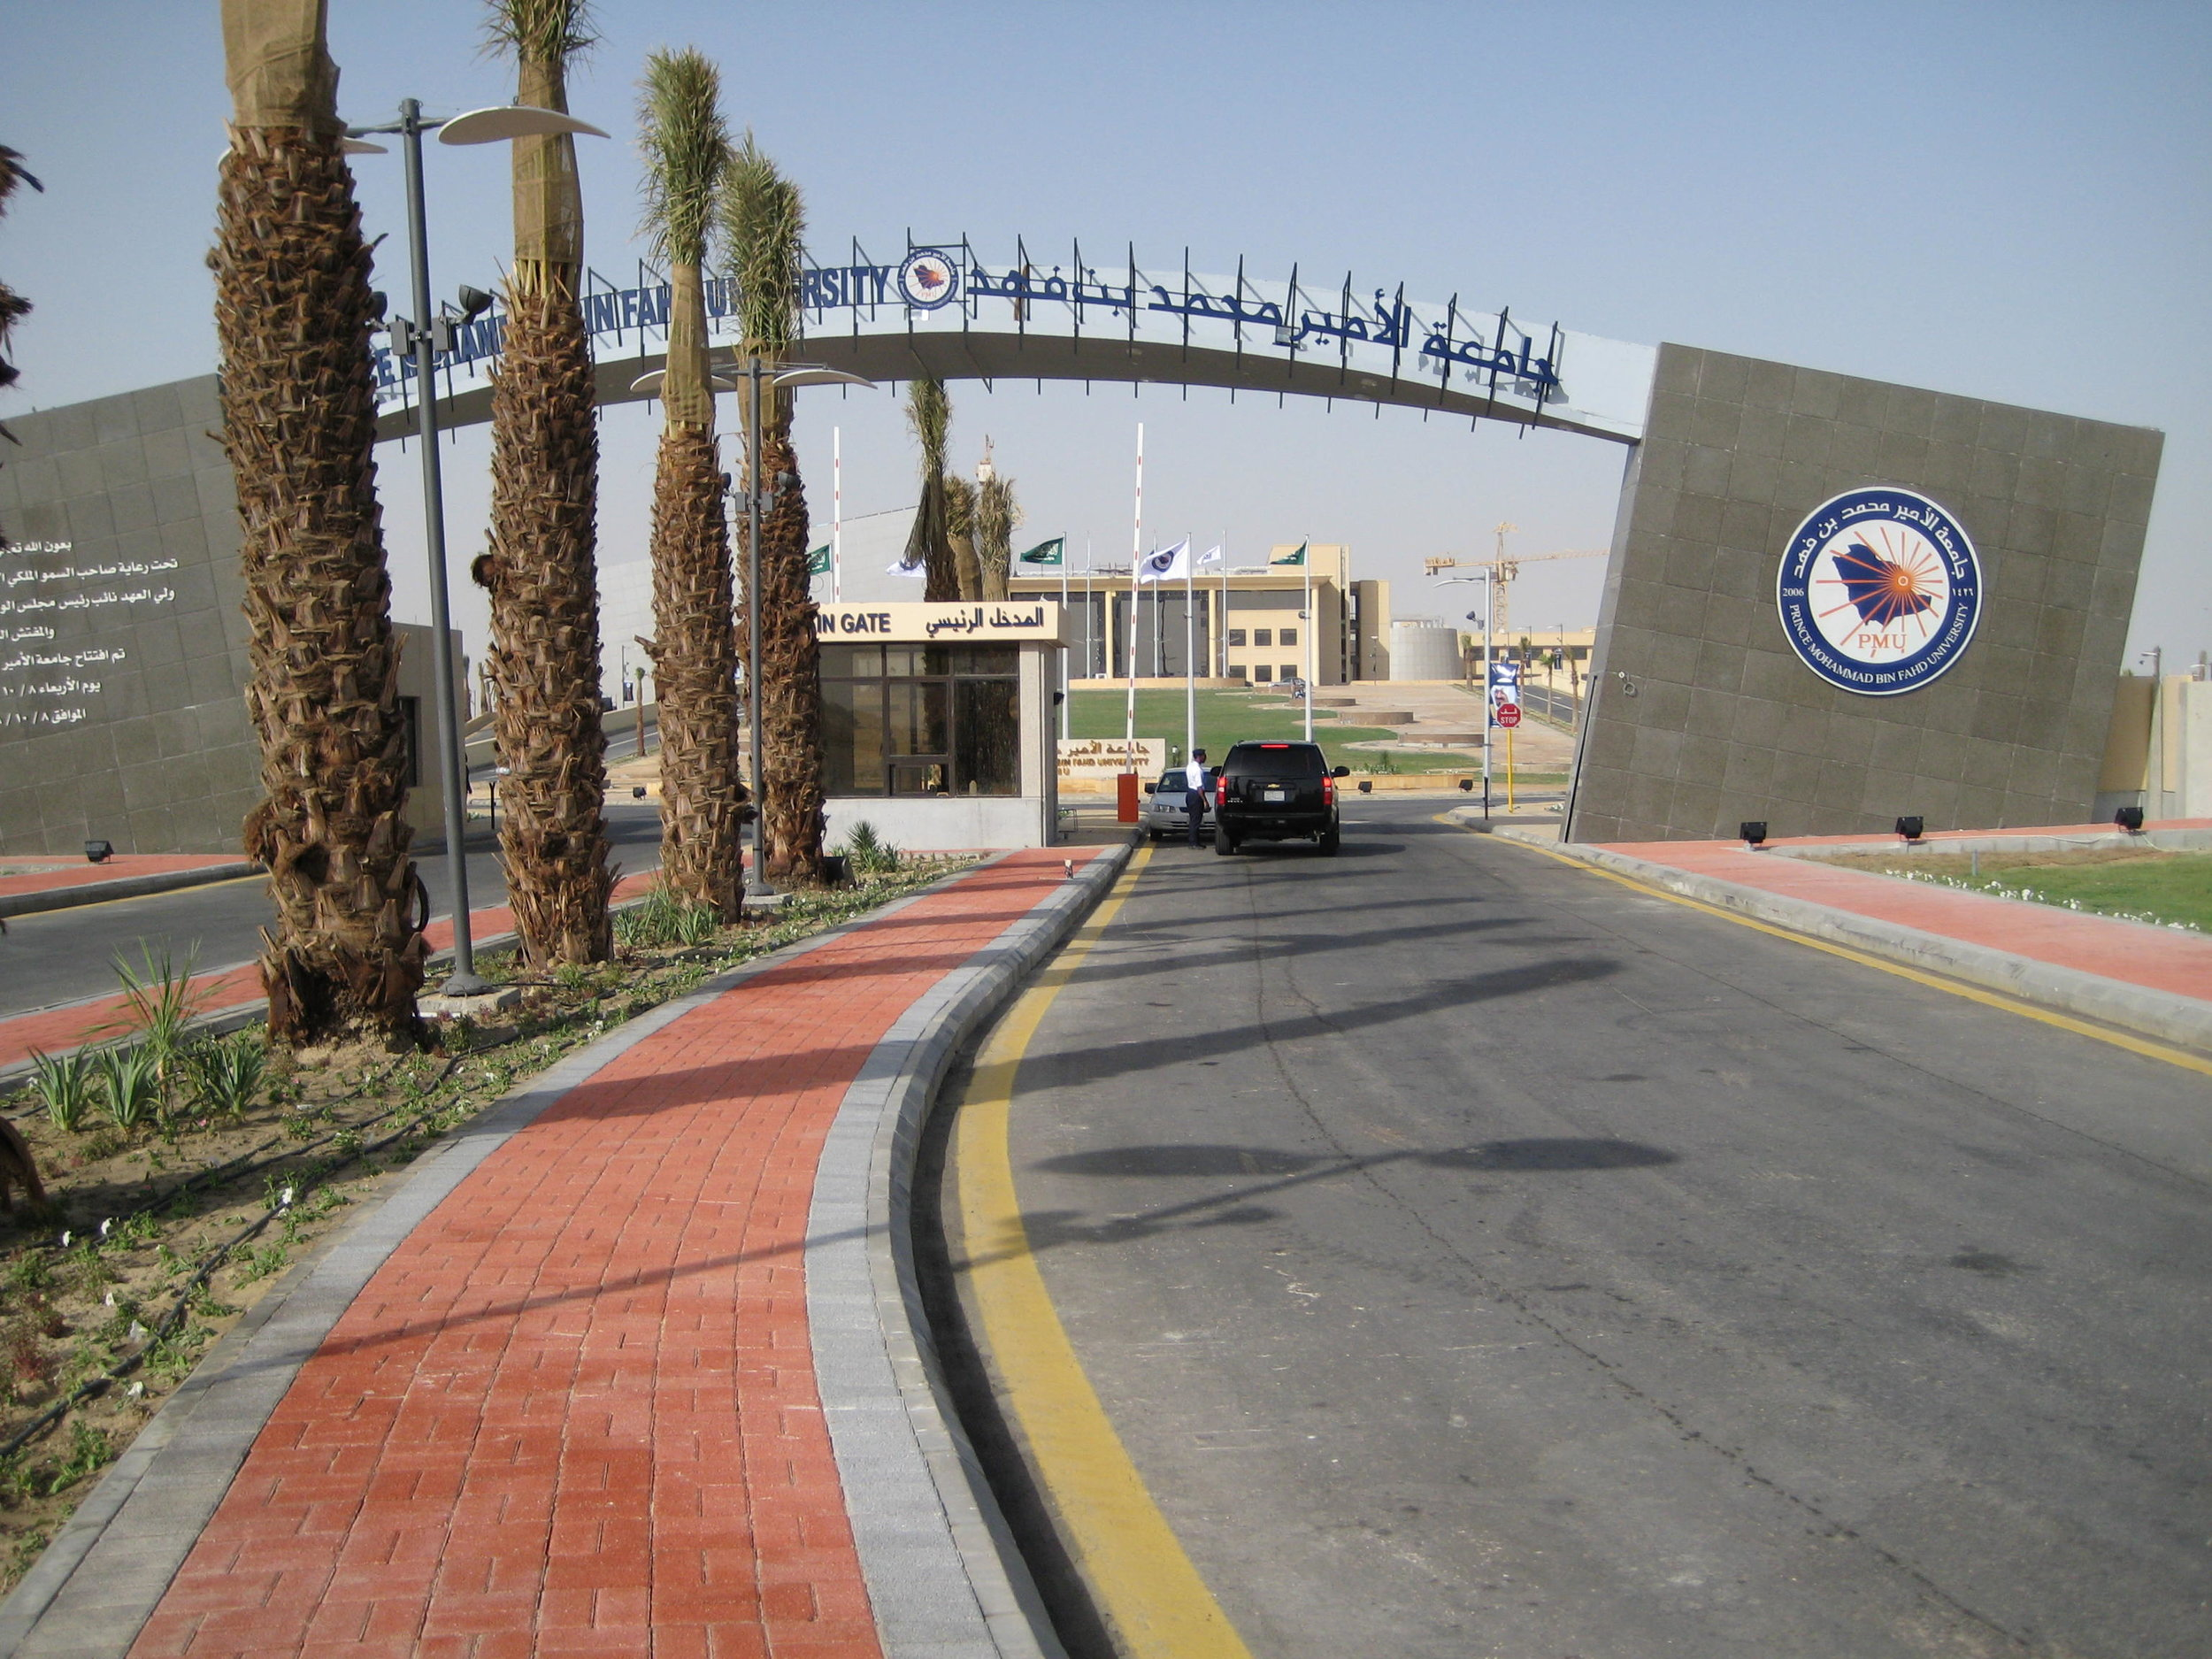 Photo of a university entrance gate in Saudi Arabia